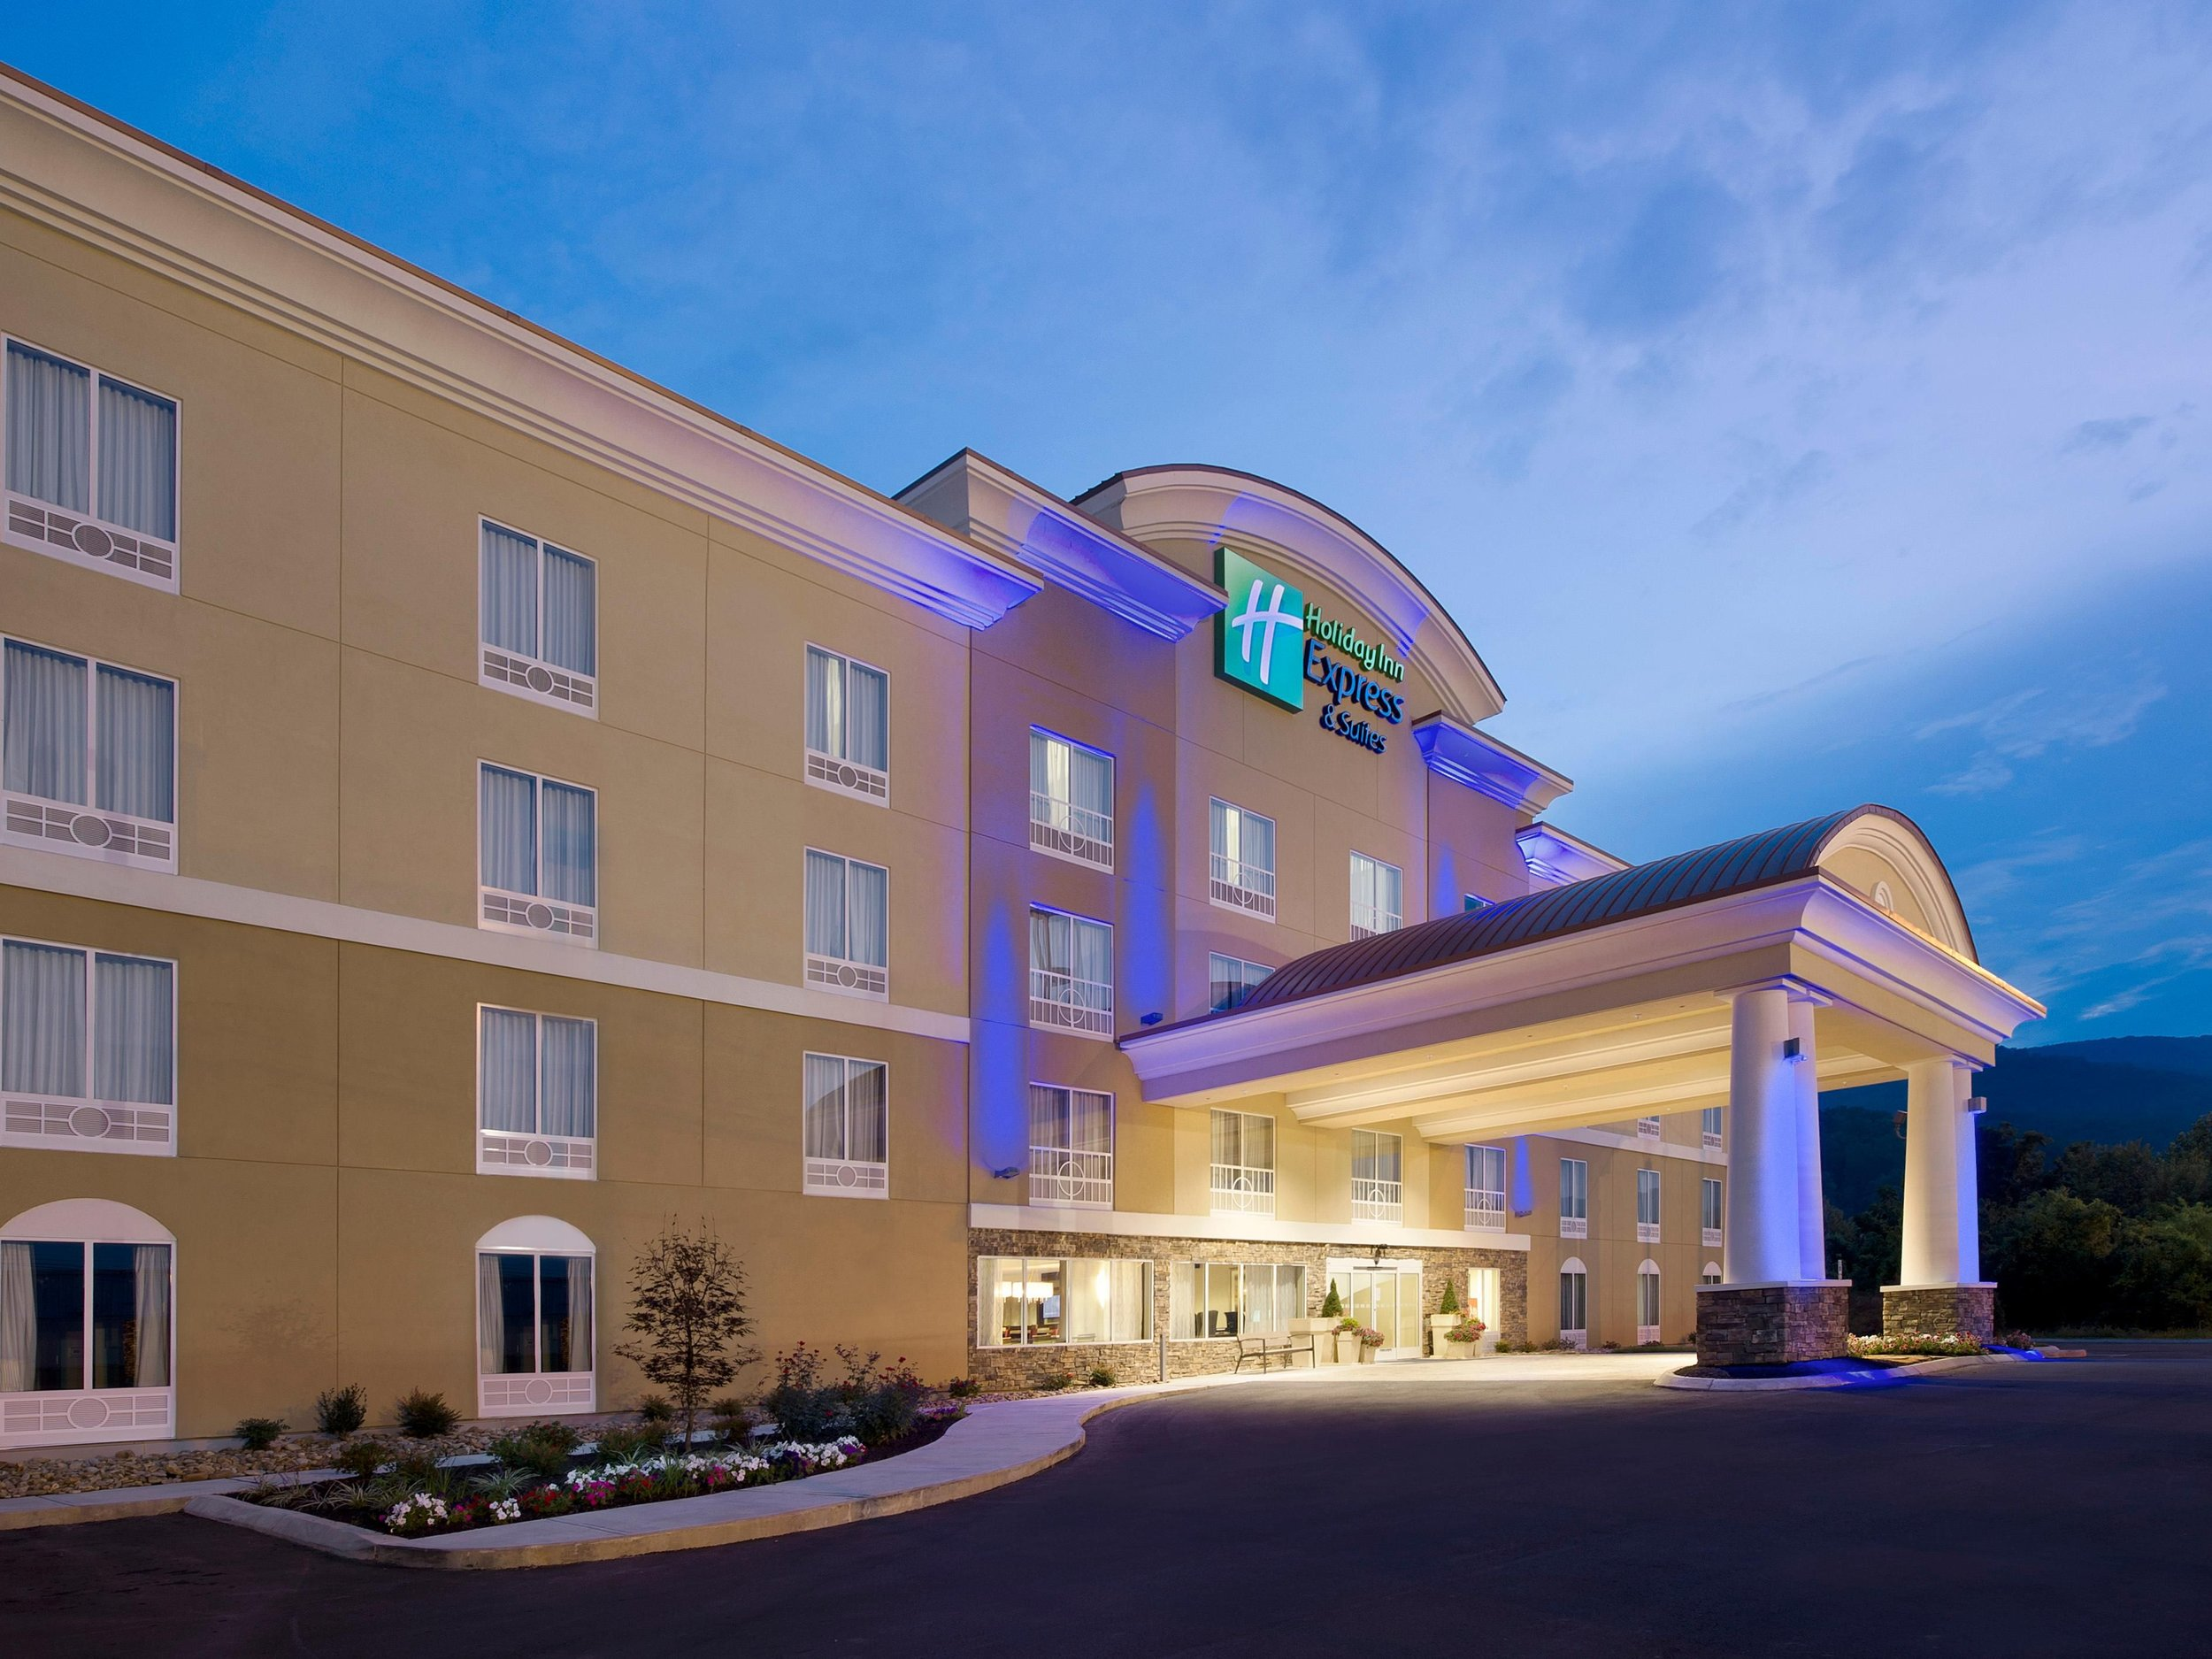 Holiday Inn Express, Caryville, TN